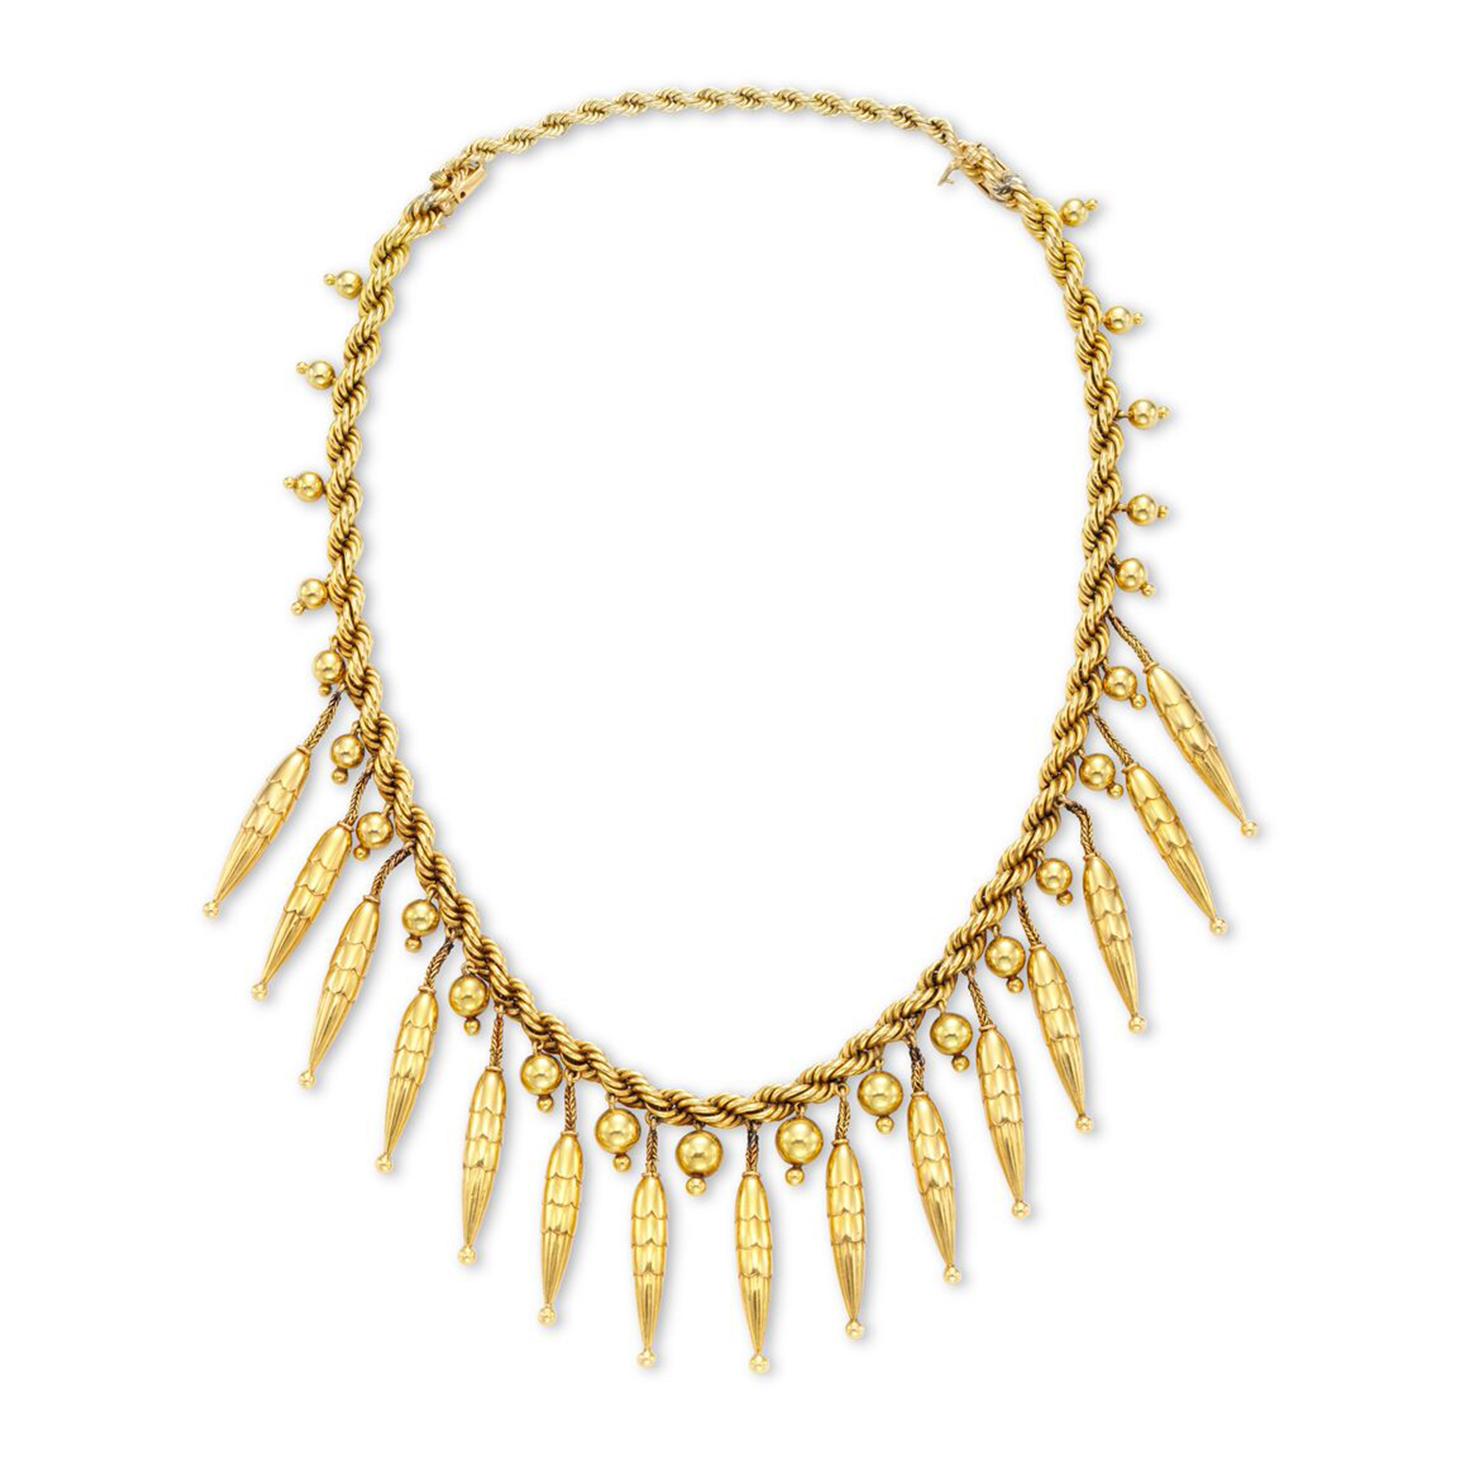 A Retro Gold Tassel Necklace, by Marchak, circa 1940